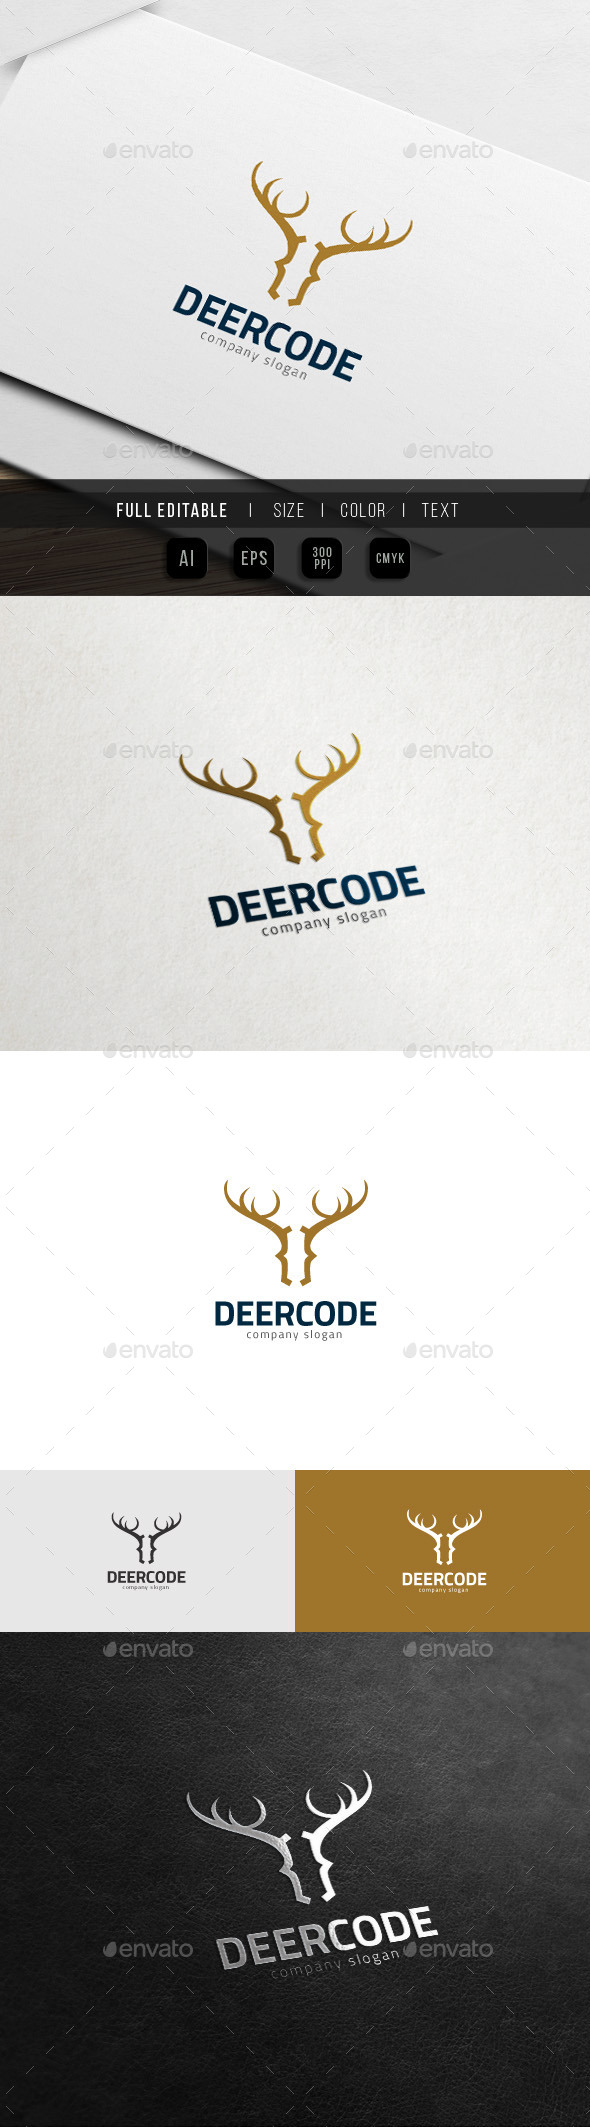 Deer Code - Wild Website Theme Logo - Symbols Logo Templates